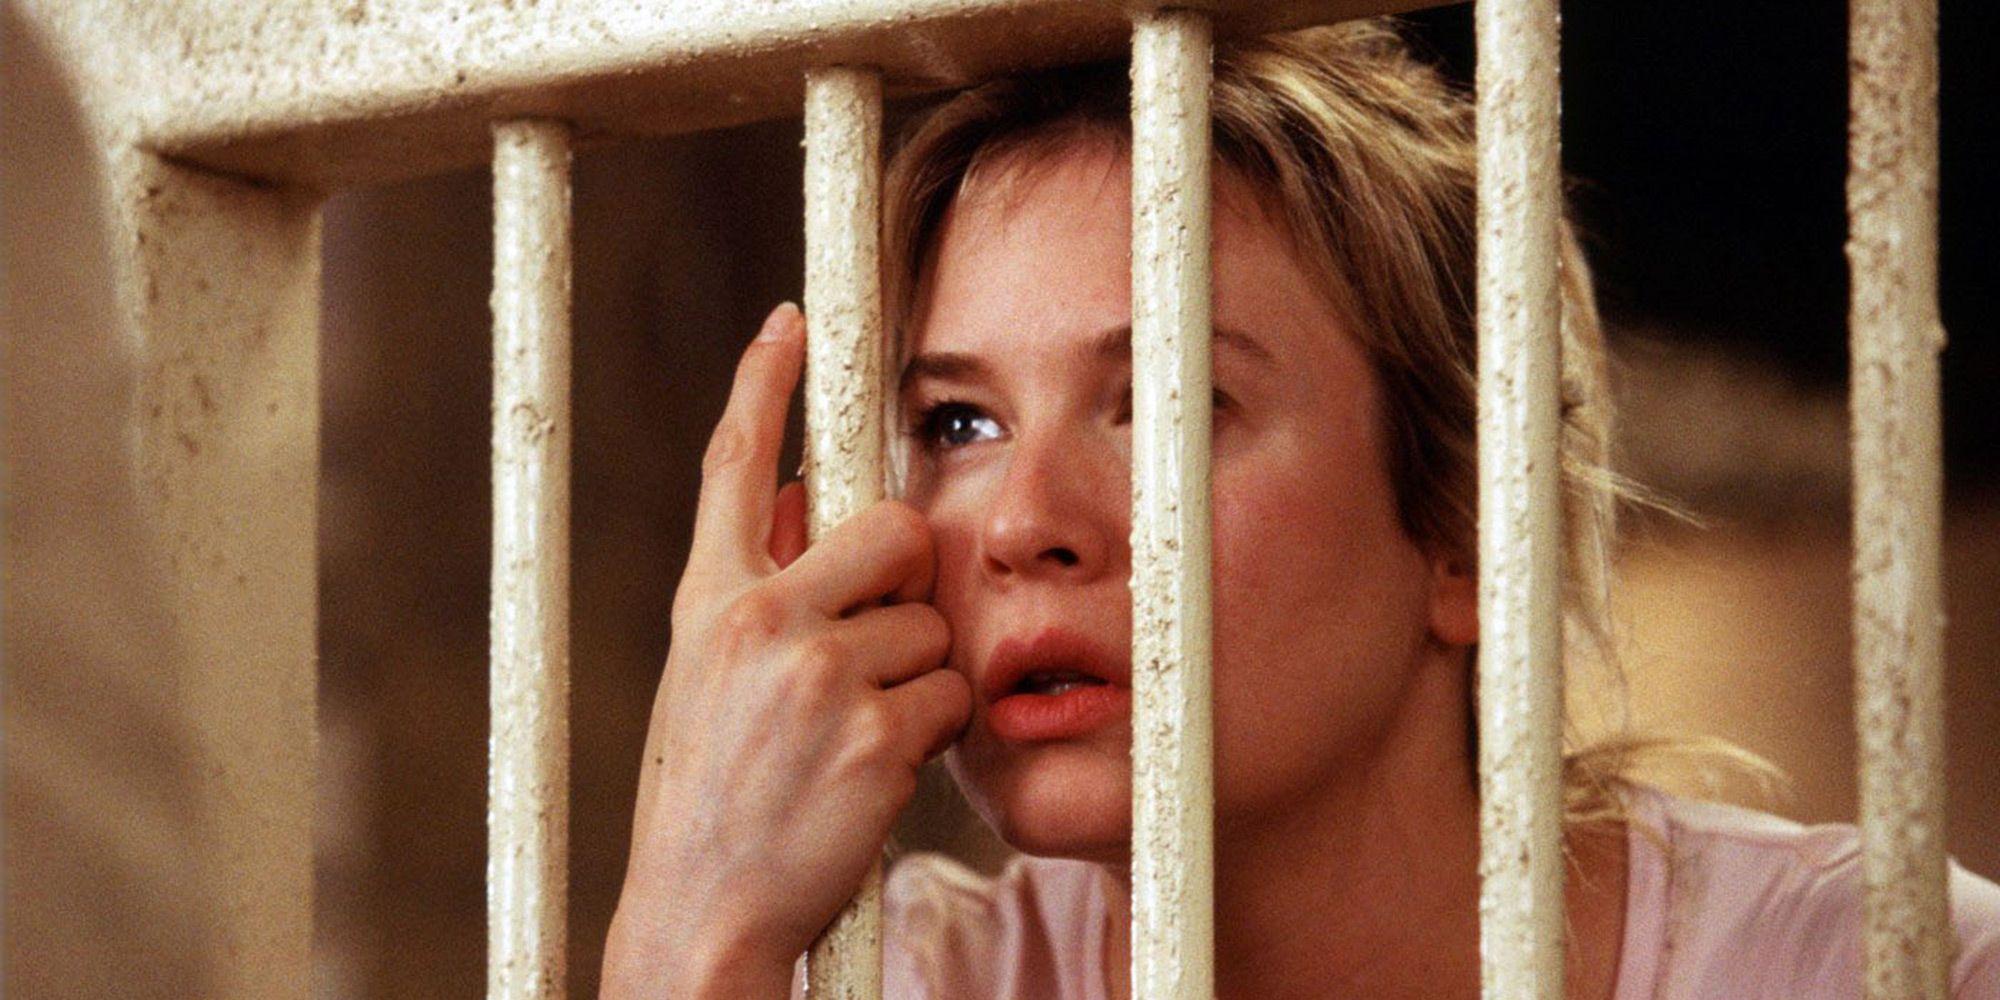 prison, Bridget Jones, arrested, jail